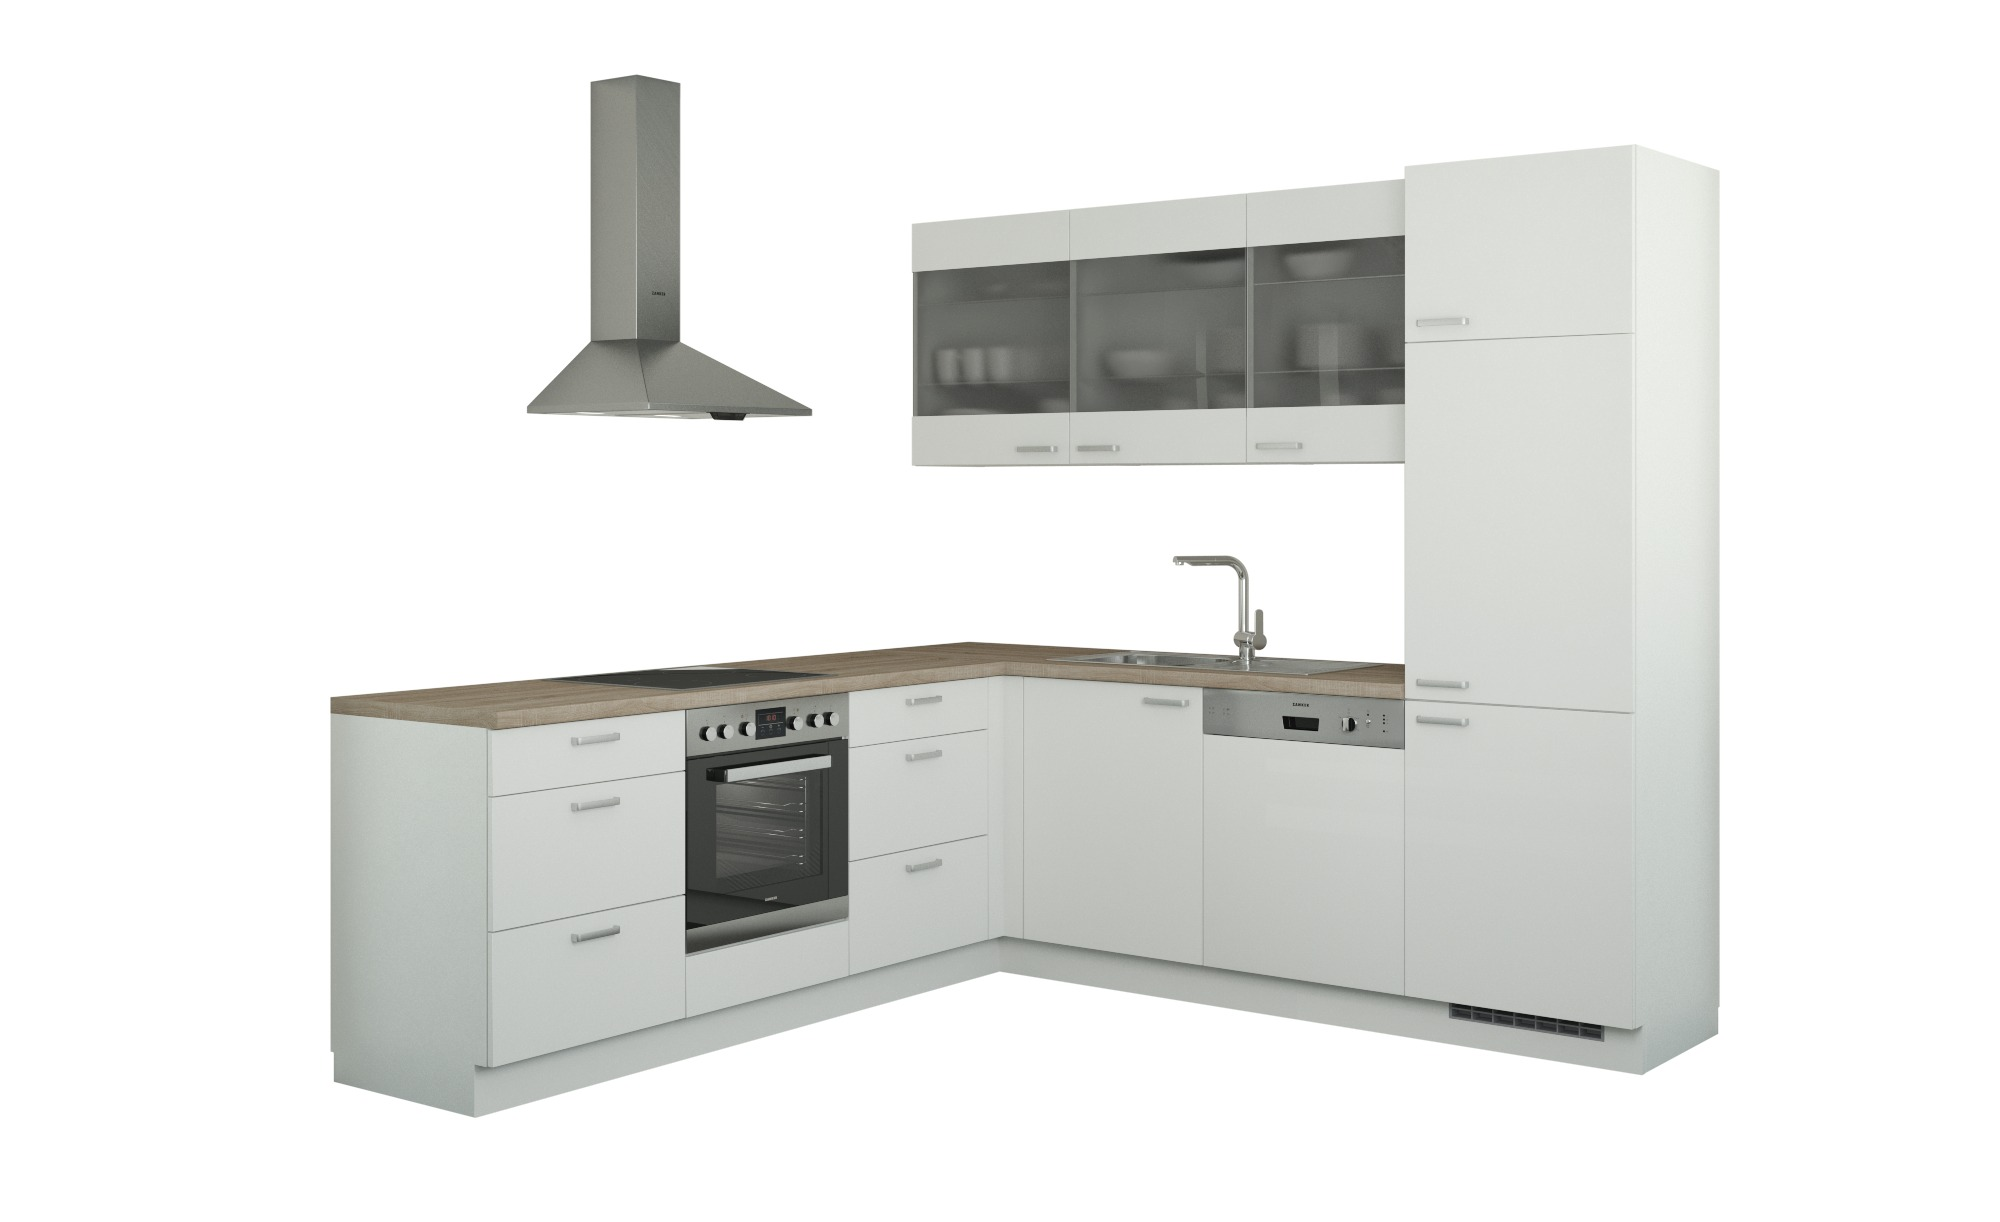 Full Size of Küche Ohne Elektrogeräte Günstig Küche Ohne Elektrogeräte Günstig Kaufen Küche Ohne Elektrogeräte Kaufen Küche Ohne Elektrogeräte Gebraucht Küche Küche Ohne Elektrogeräte